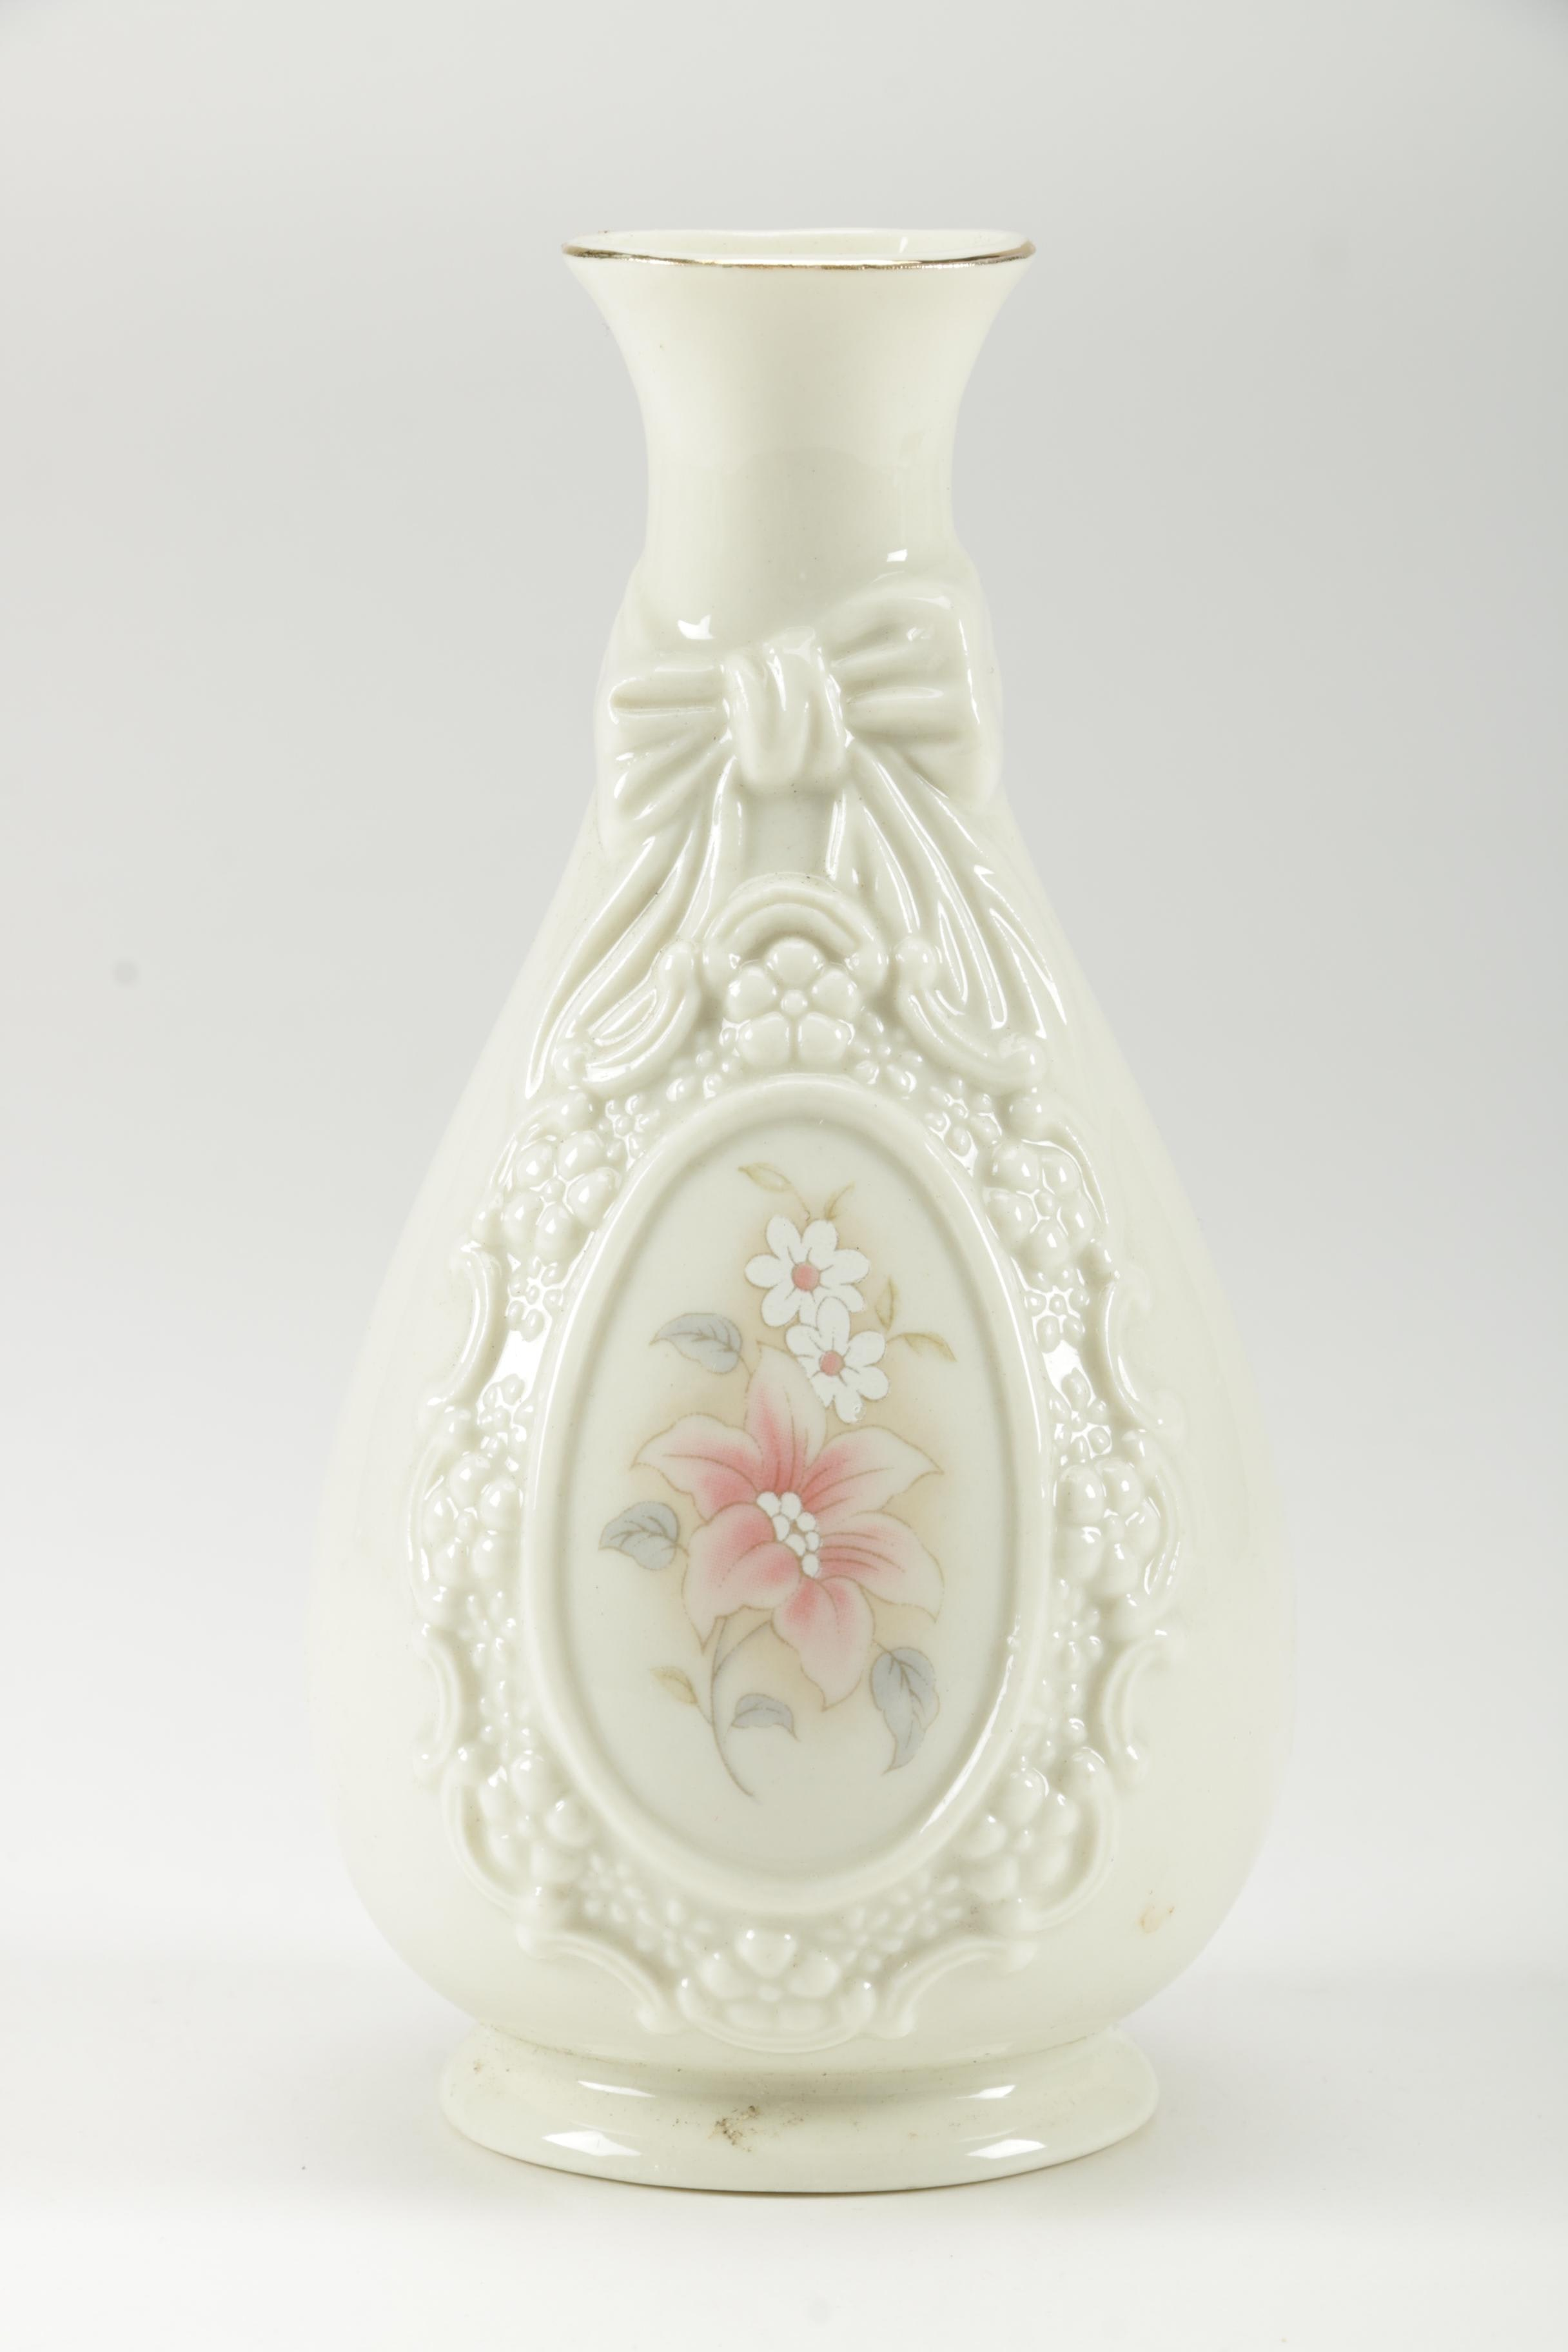 White Porcelain And Ceramic Vases And Bird Figurine Ebth